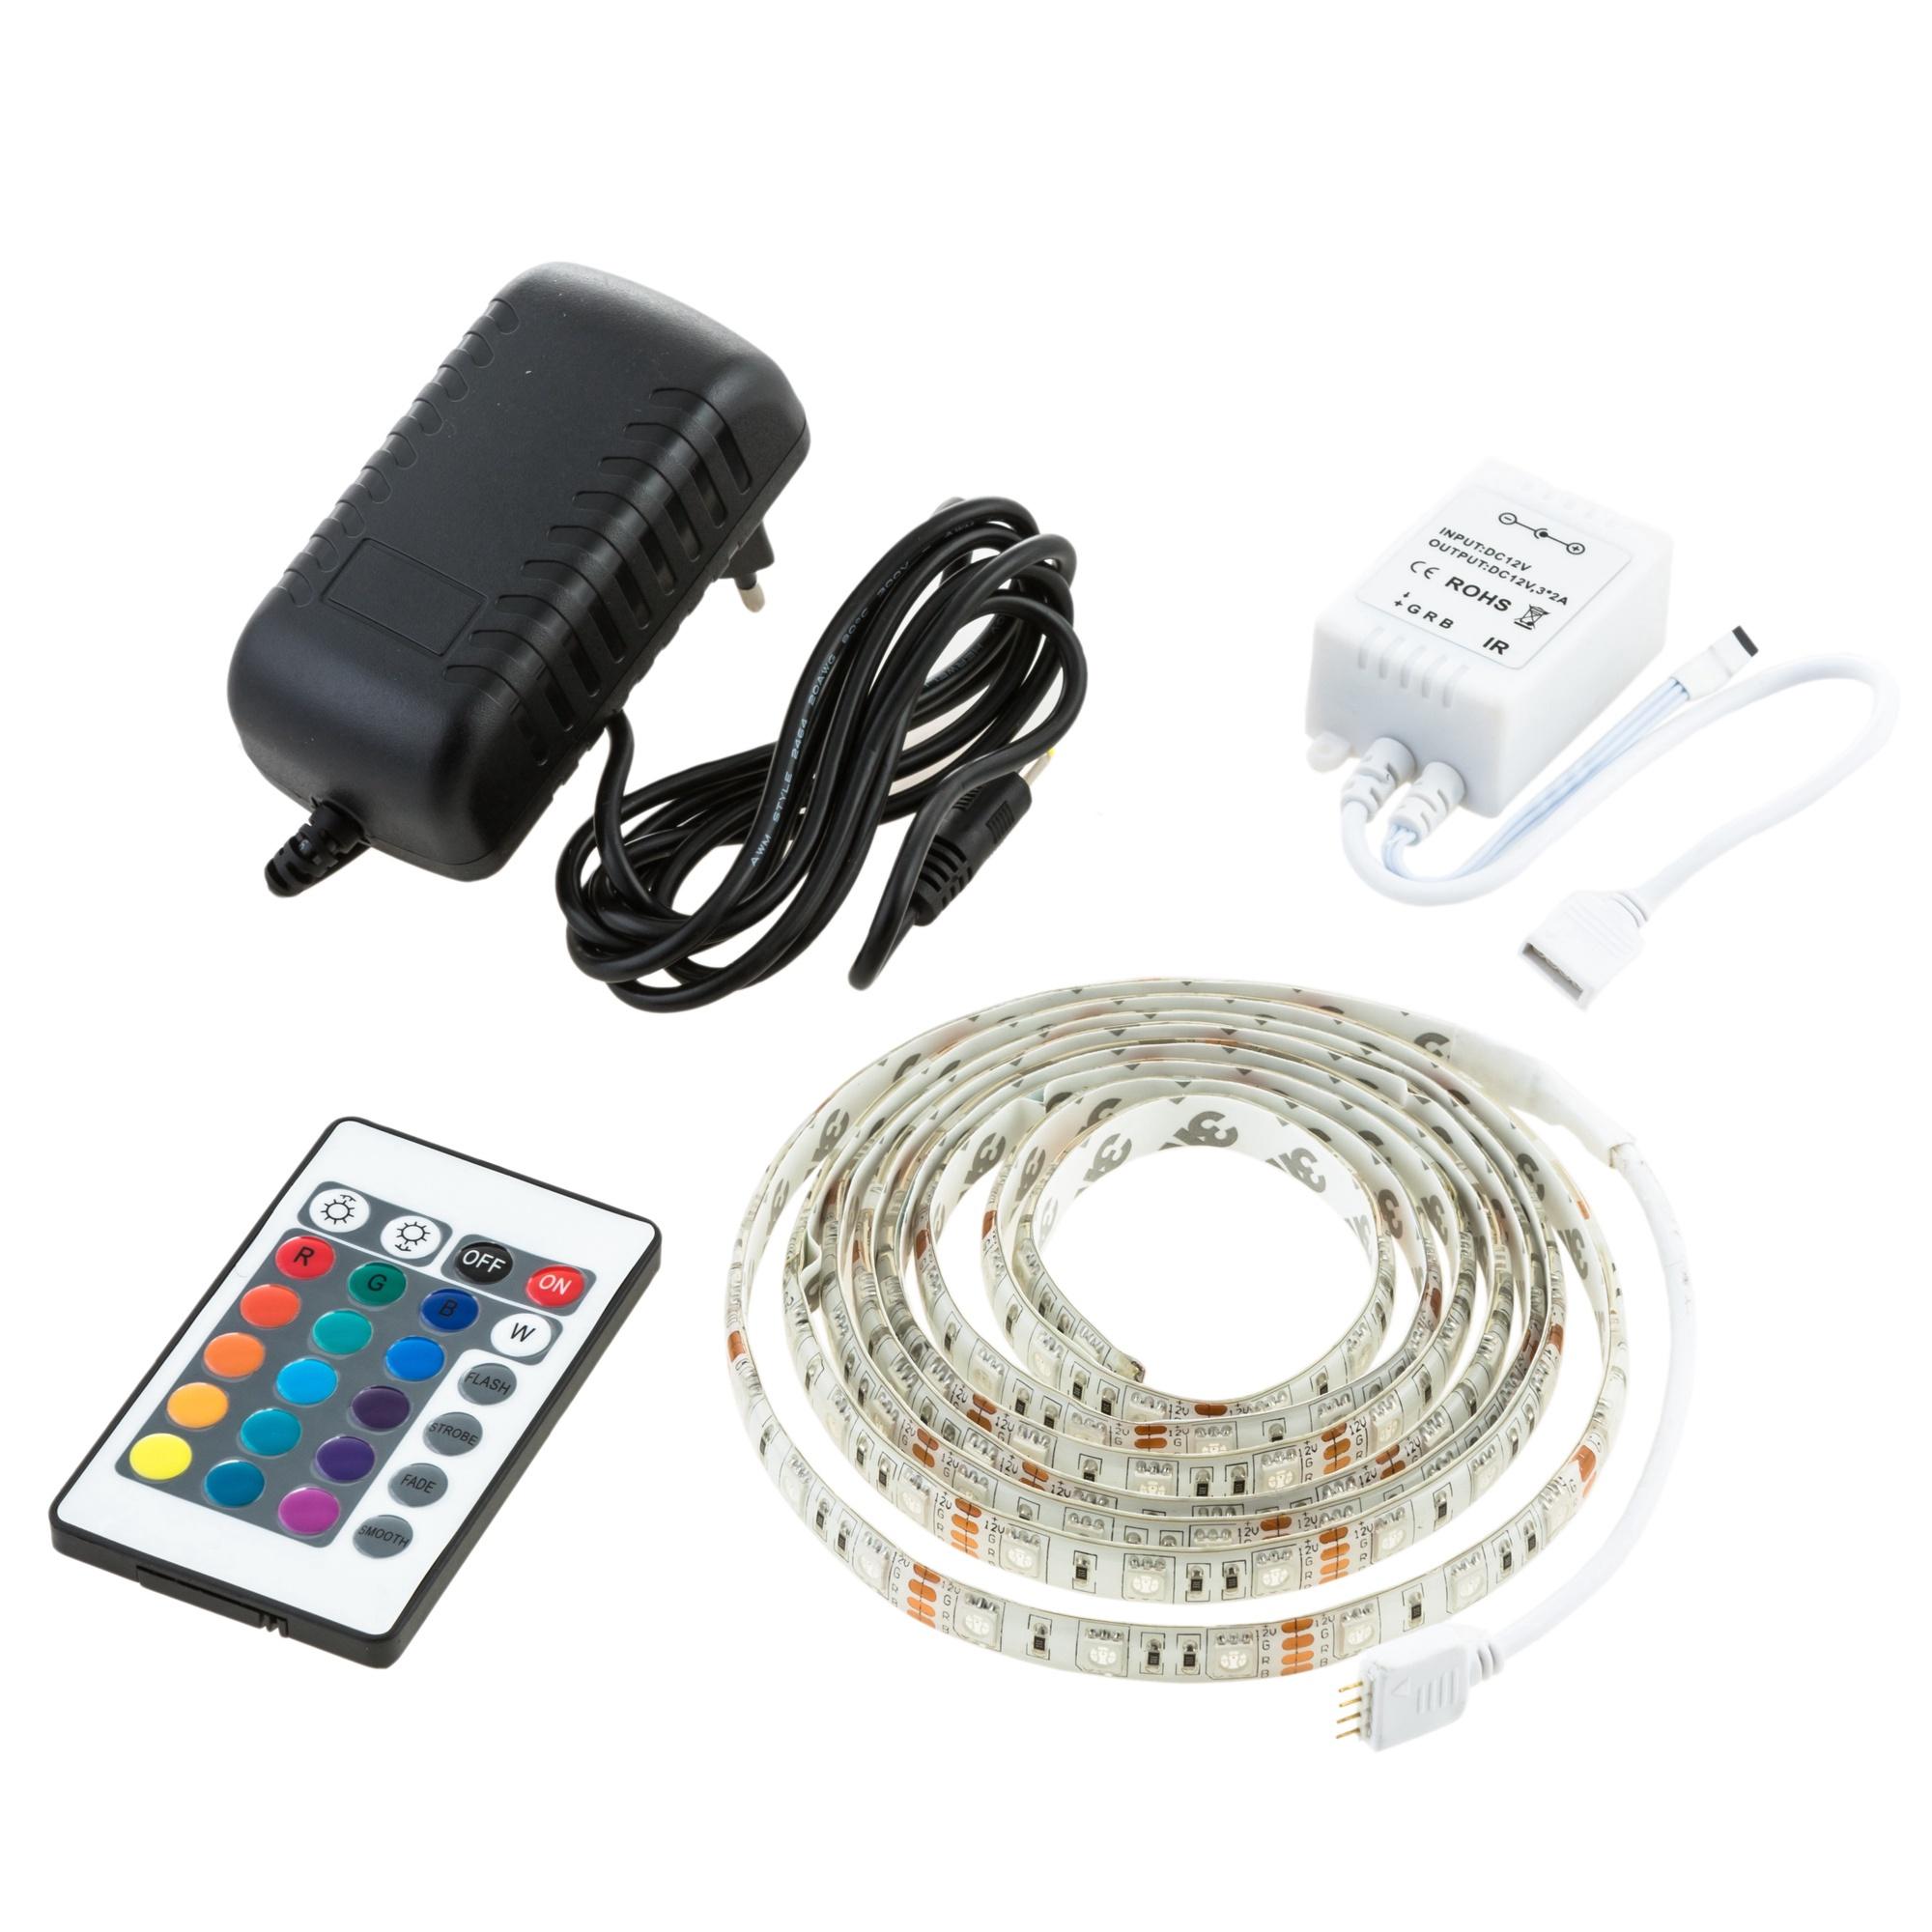 204a1686d5d LED-riba Vagner SDH 5050, 14.4W IP65, 2m, RGB - Krauta.ee